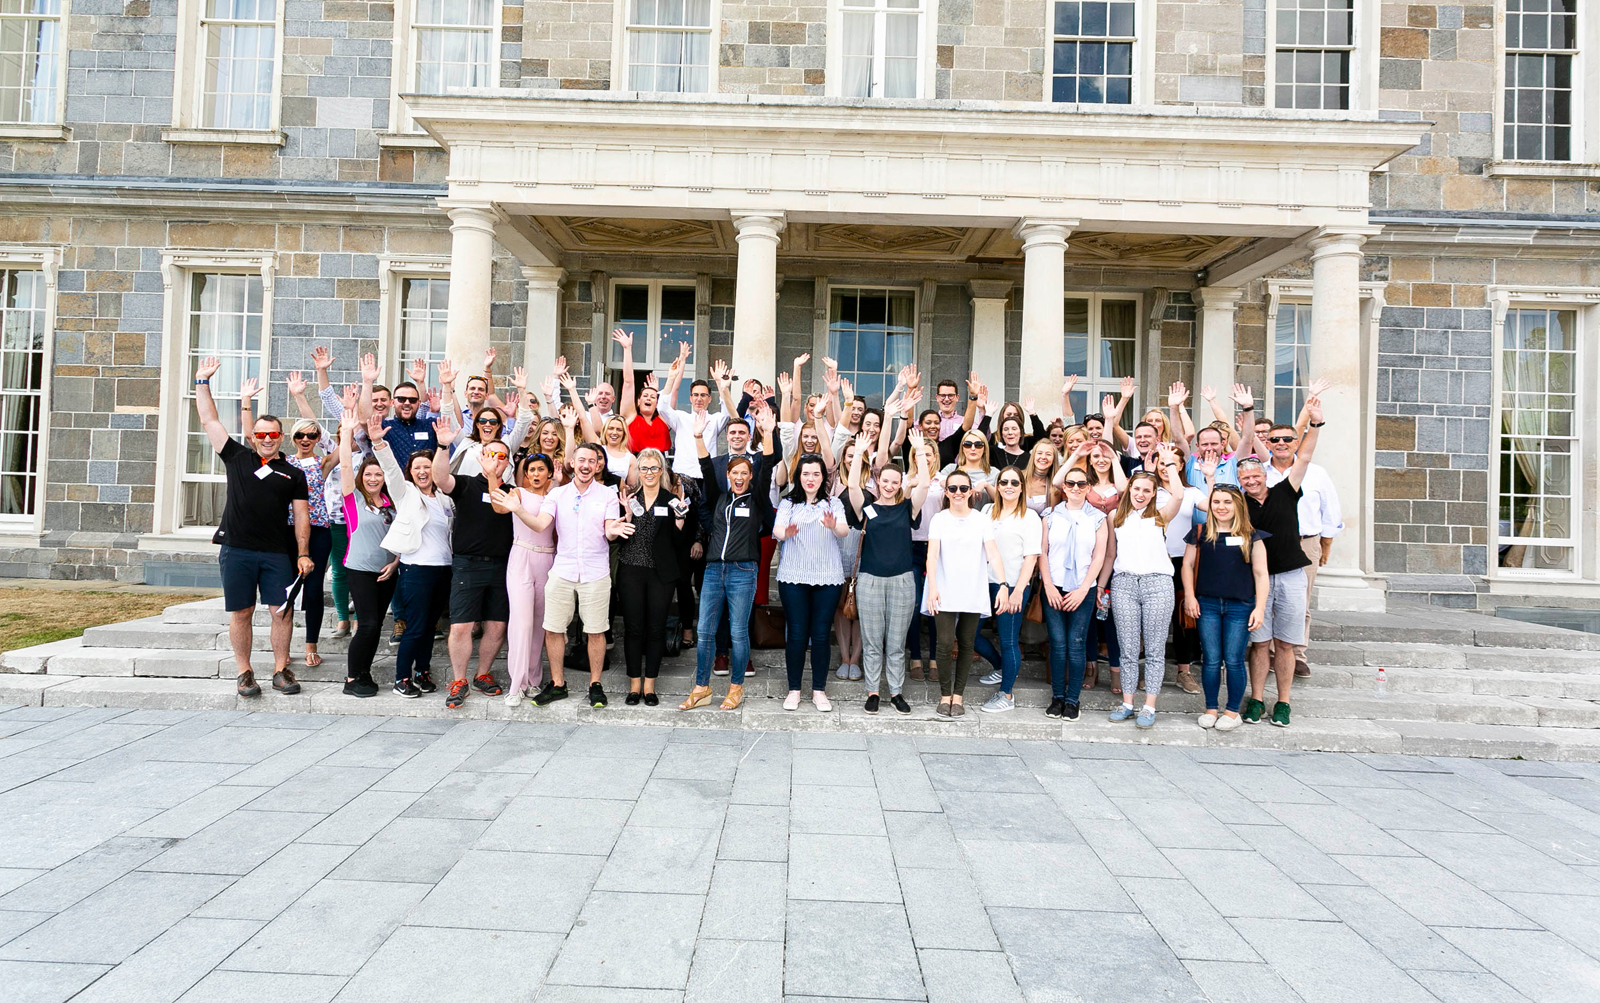 Partnering With Carton House For The SITE Ireland Summer Soirée